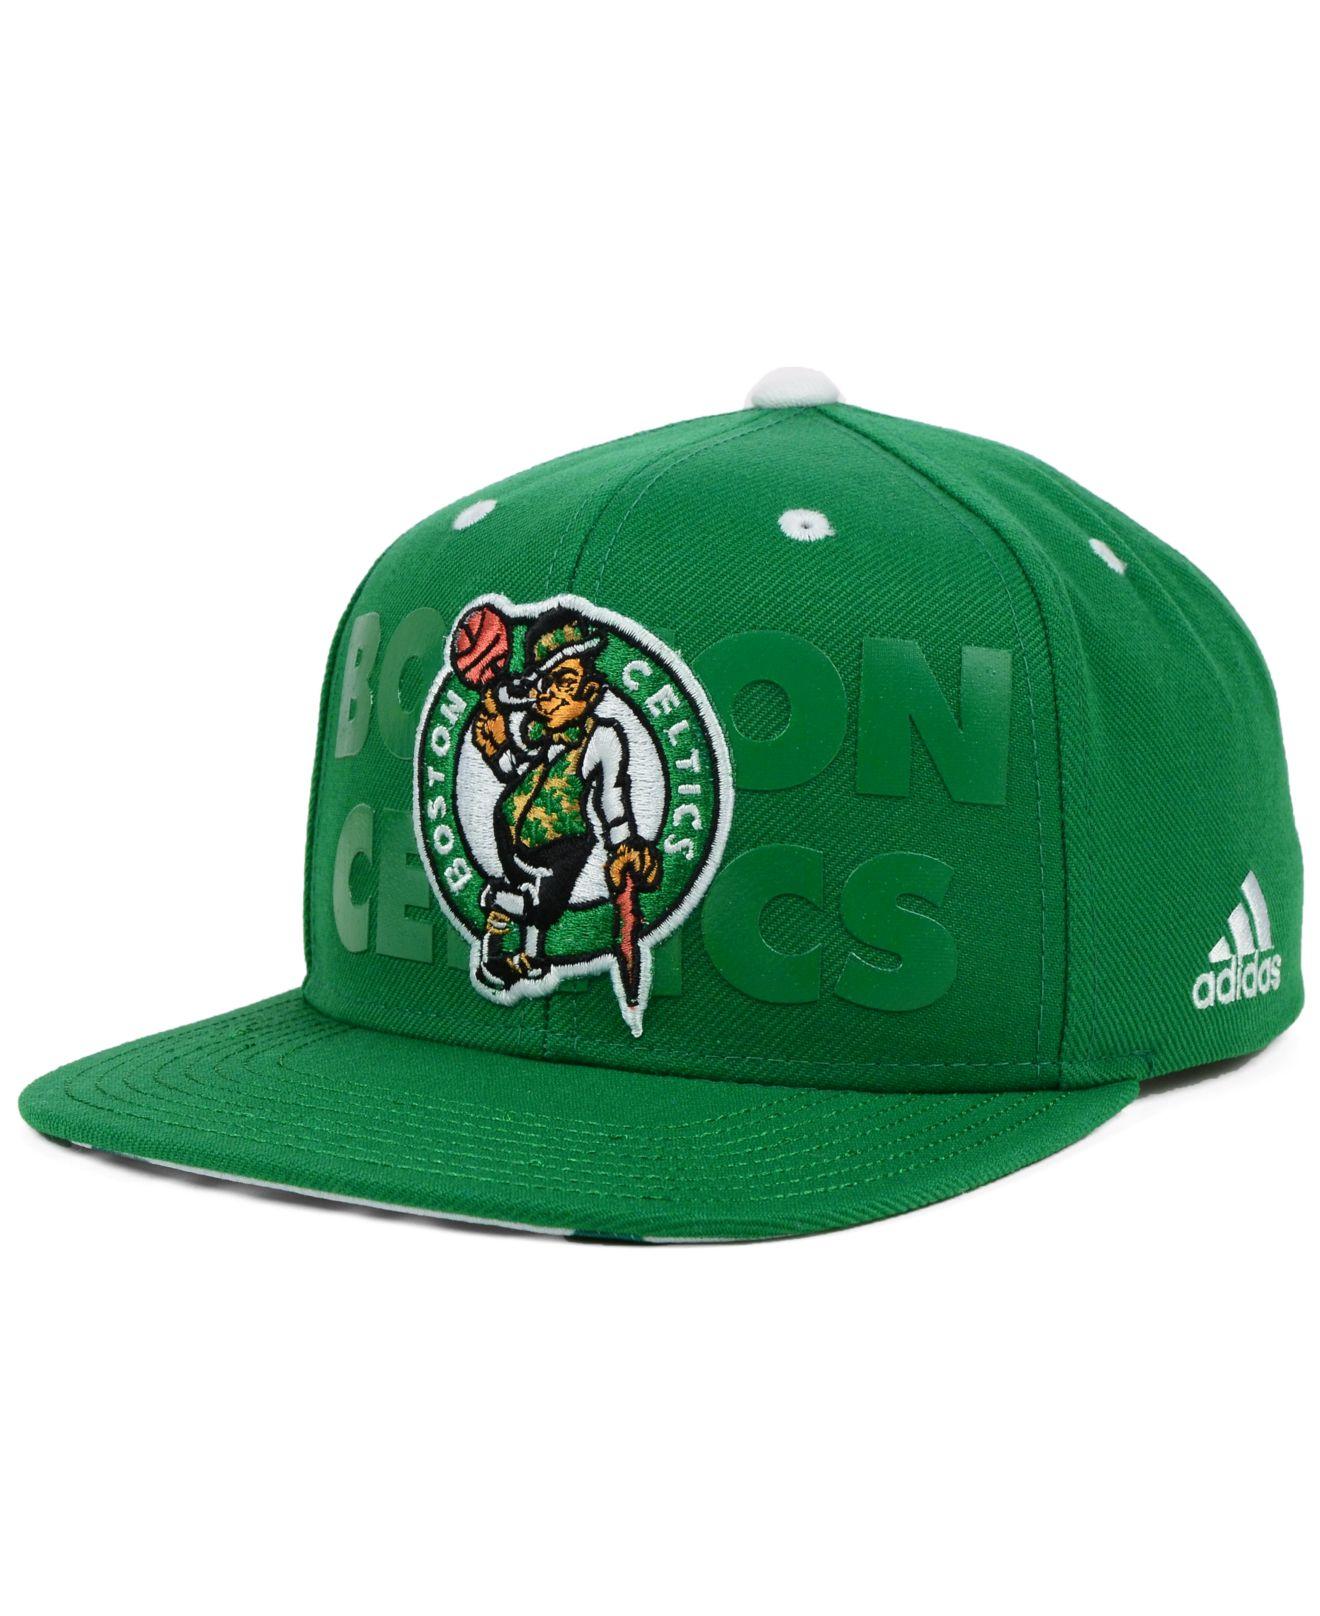 Lyst - adidas Boston Celtics Nba 2014 Draft Snapback Cap in Green ... 75d8e6d8fe6